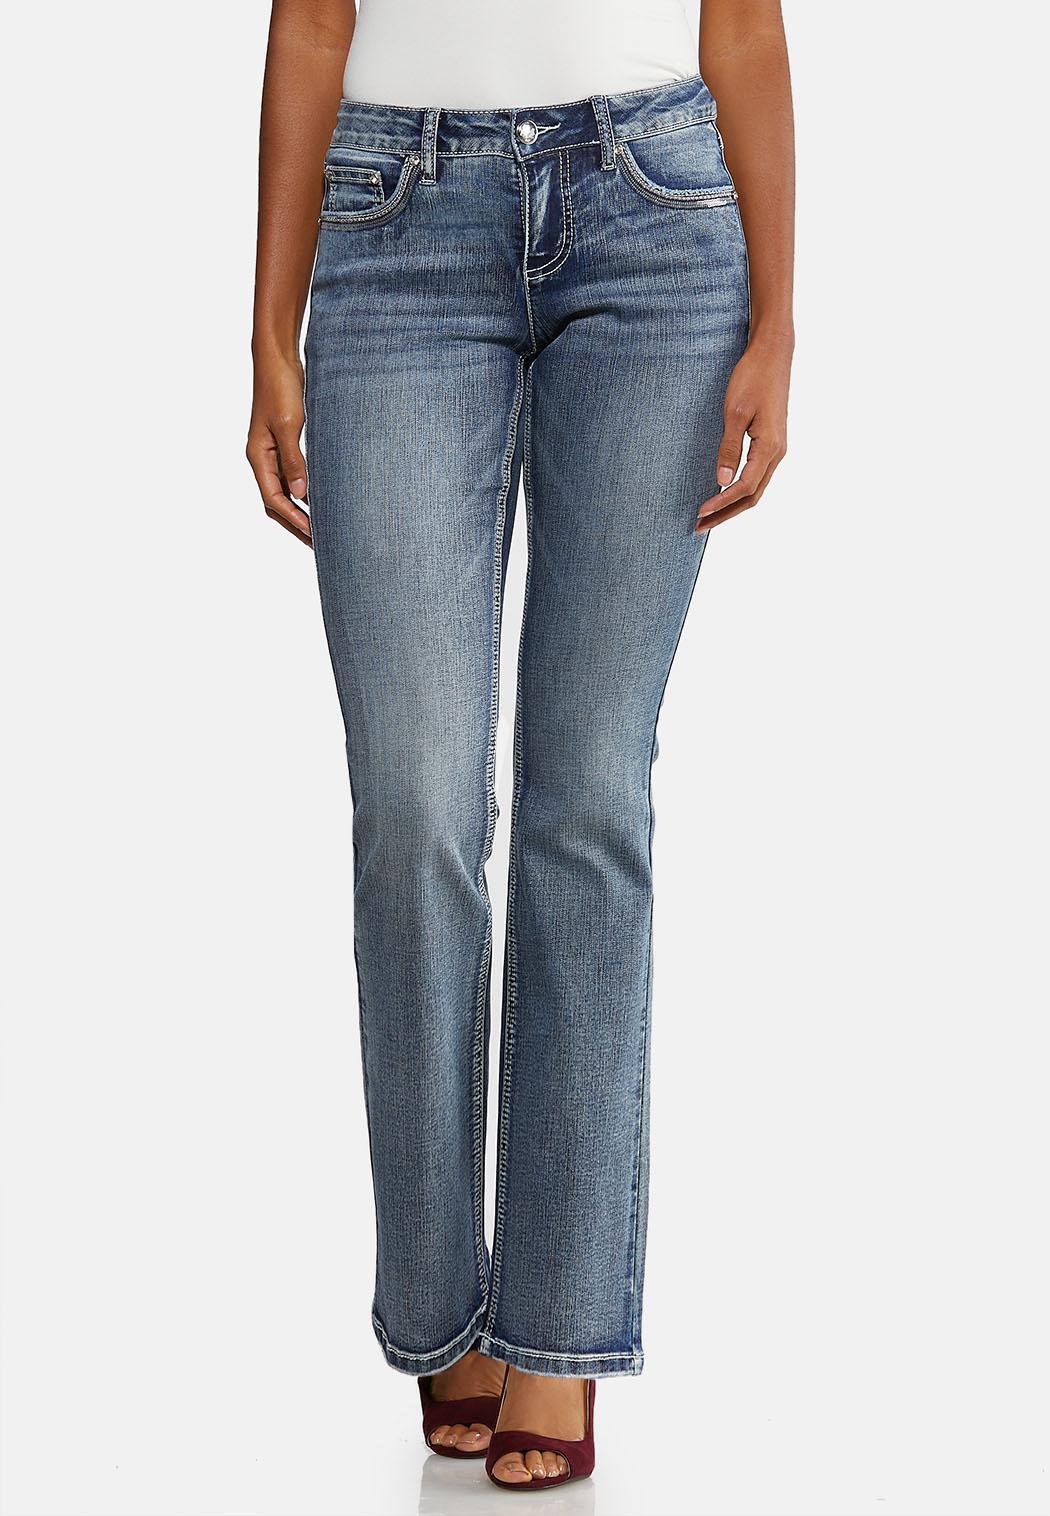 Chevron Bling Bootcut Jeans (Item #43991491)